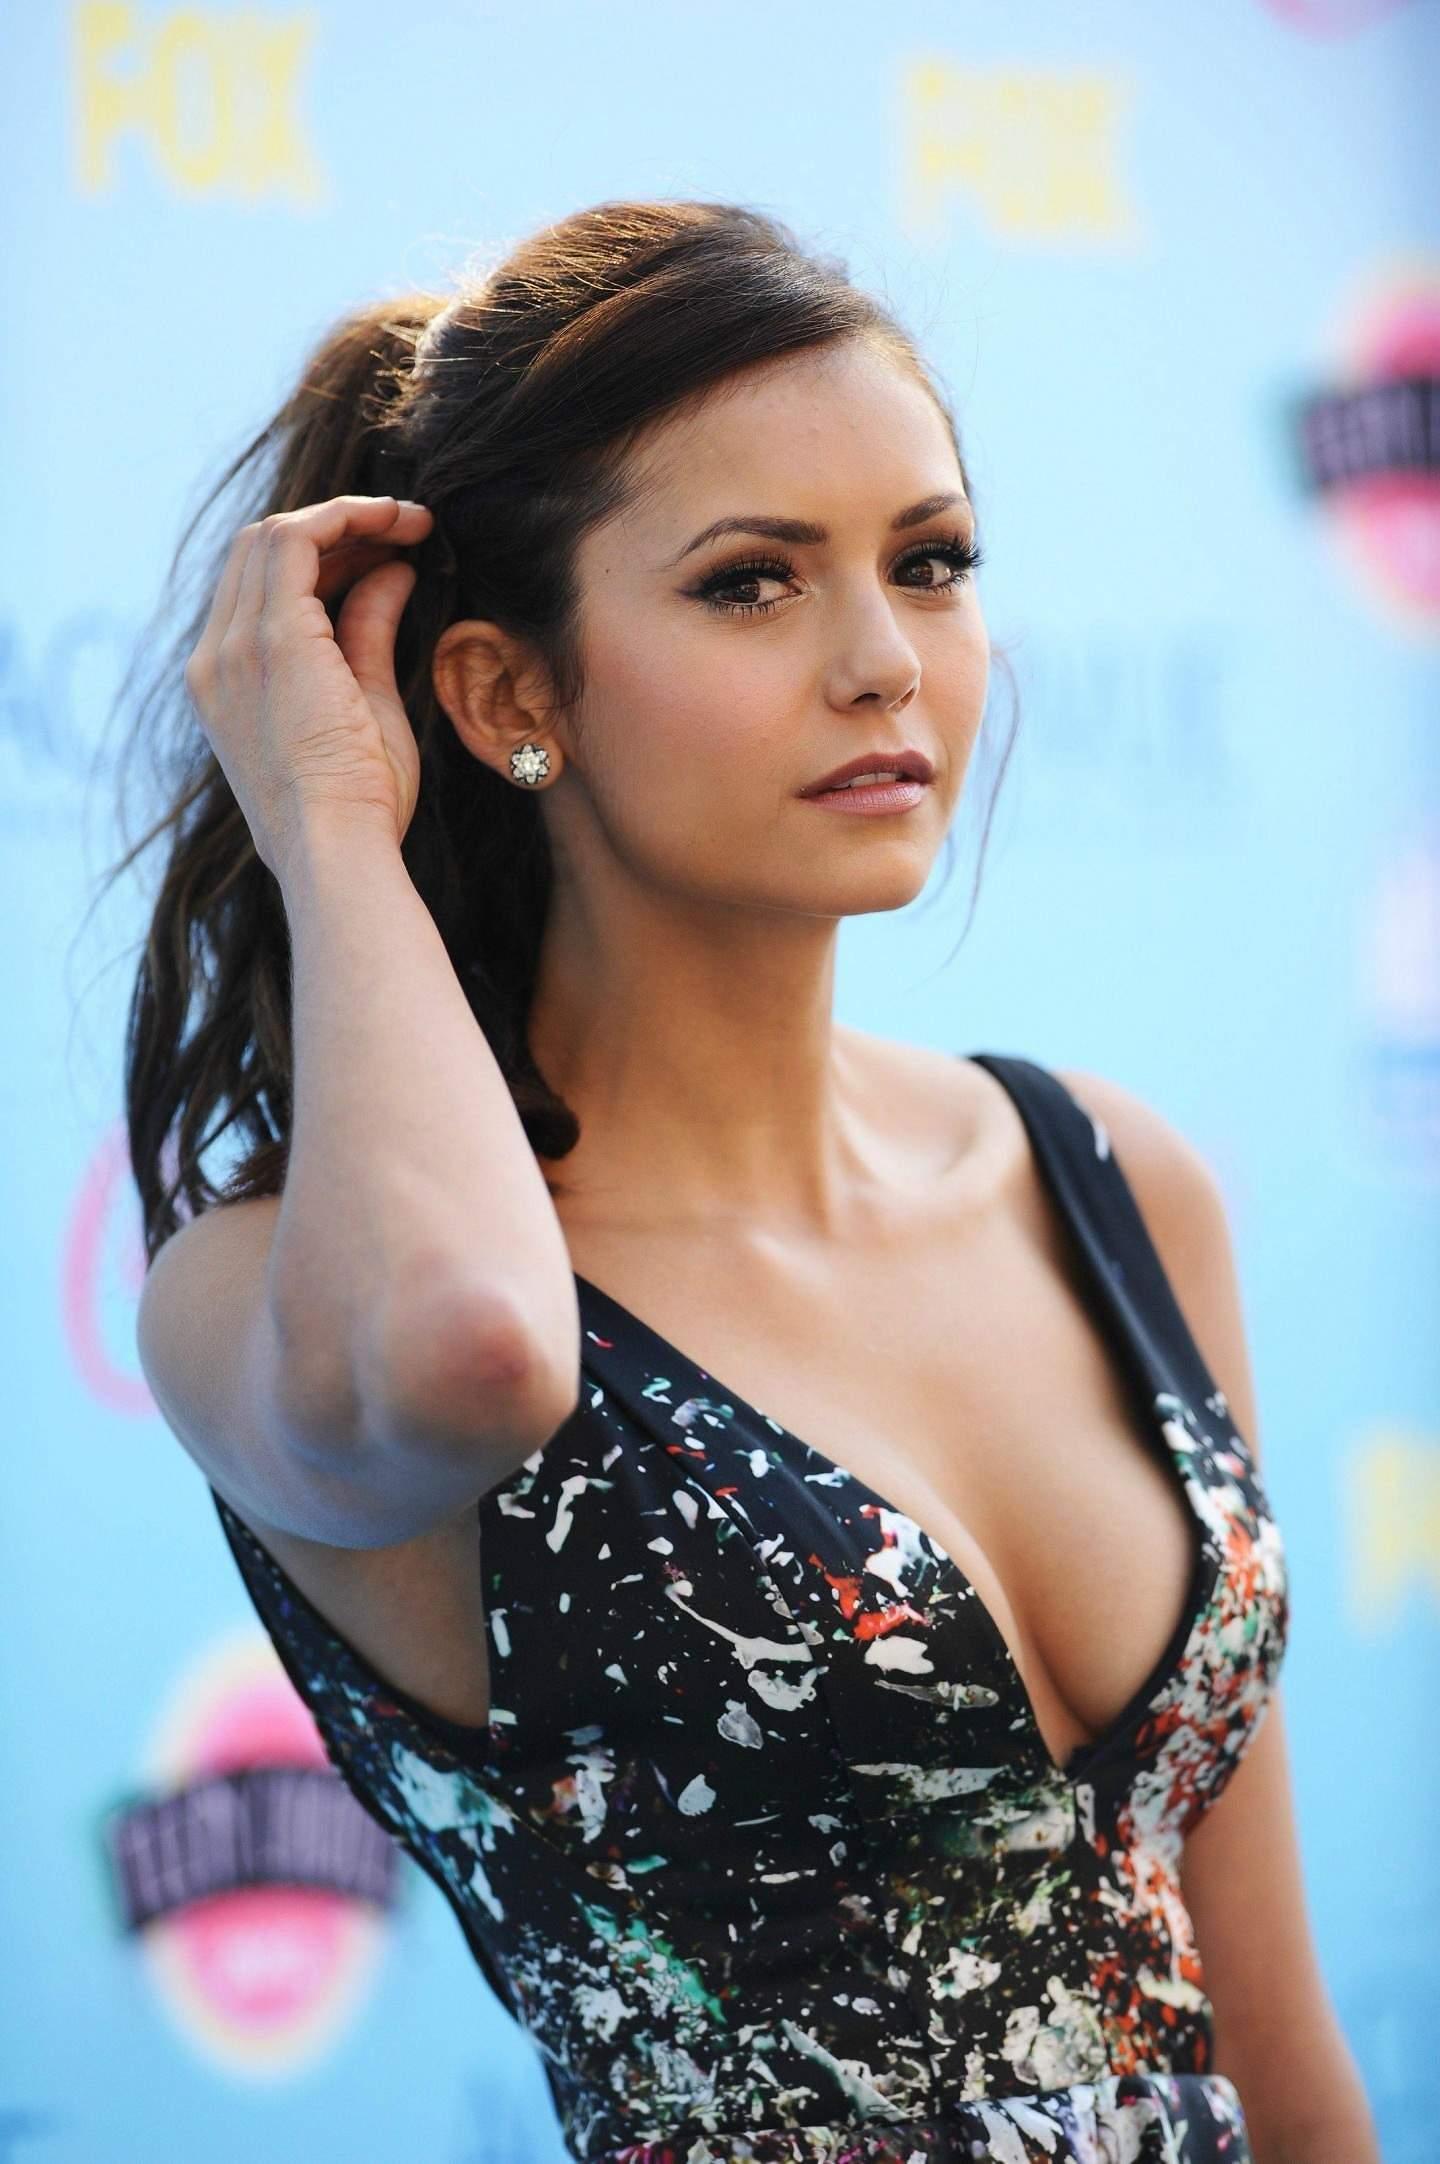 Jobbiecrew S Hot Honey Of The Week Bulgarian Beauty Nina